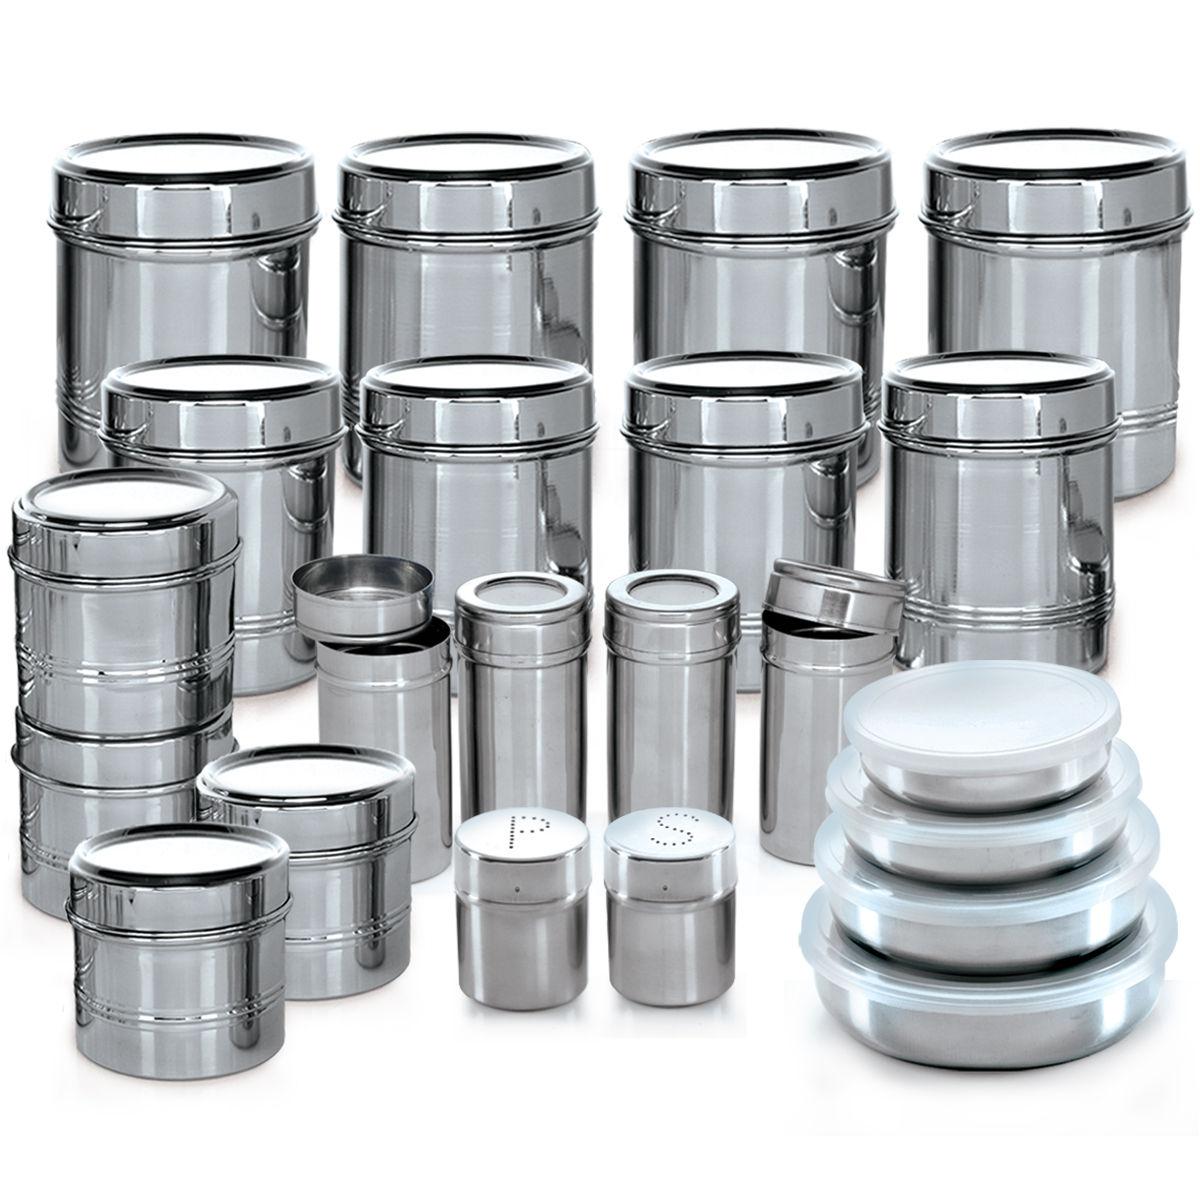 Buy branded 44 pcs stainless steel storage set online at for Steel kitchen set